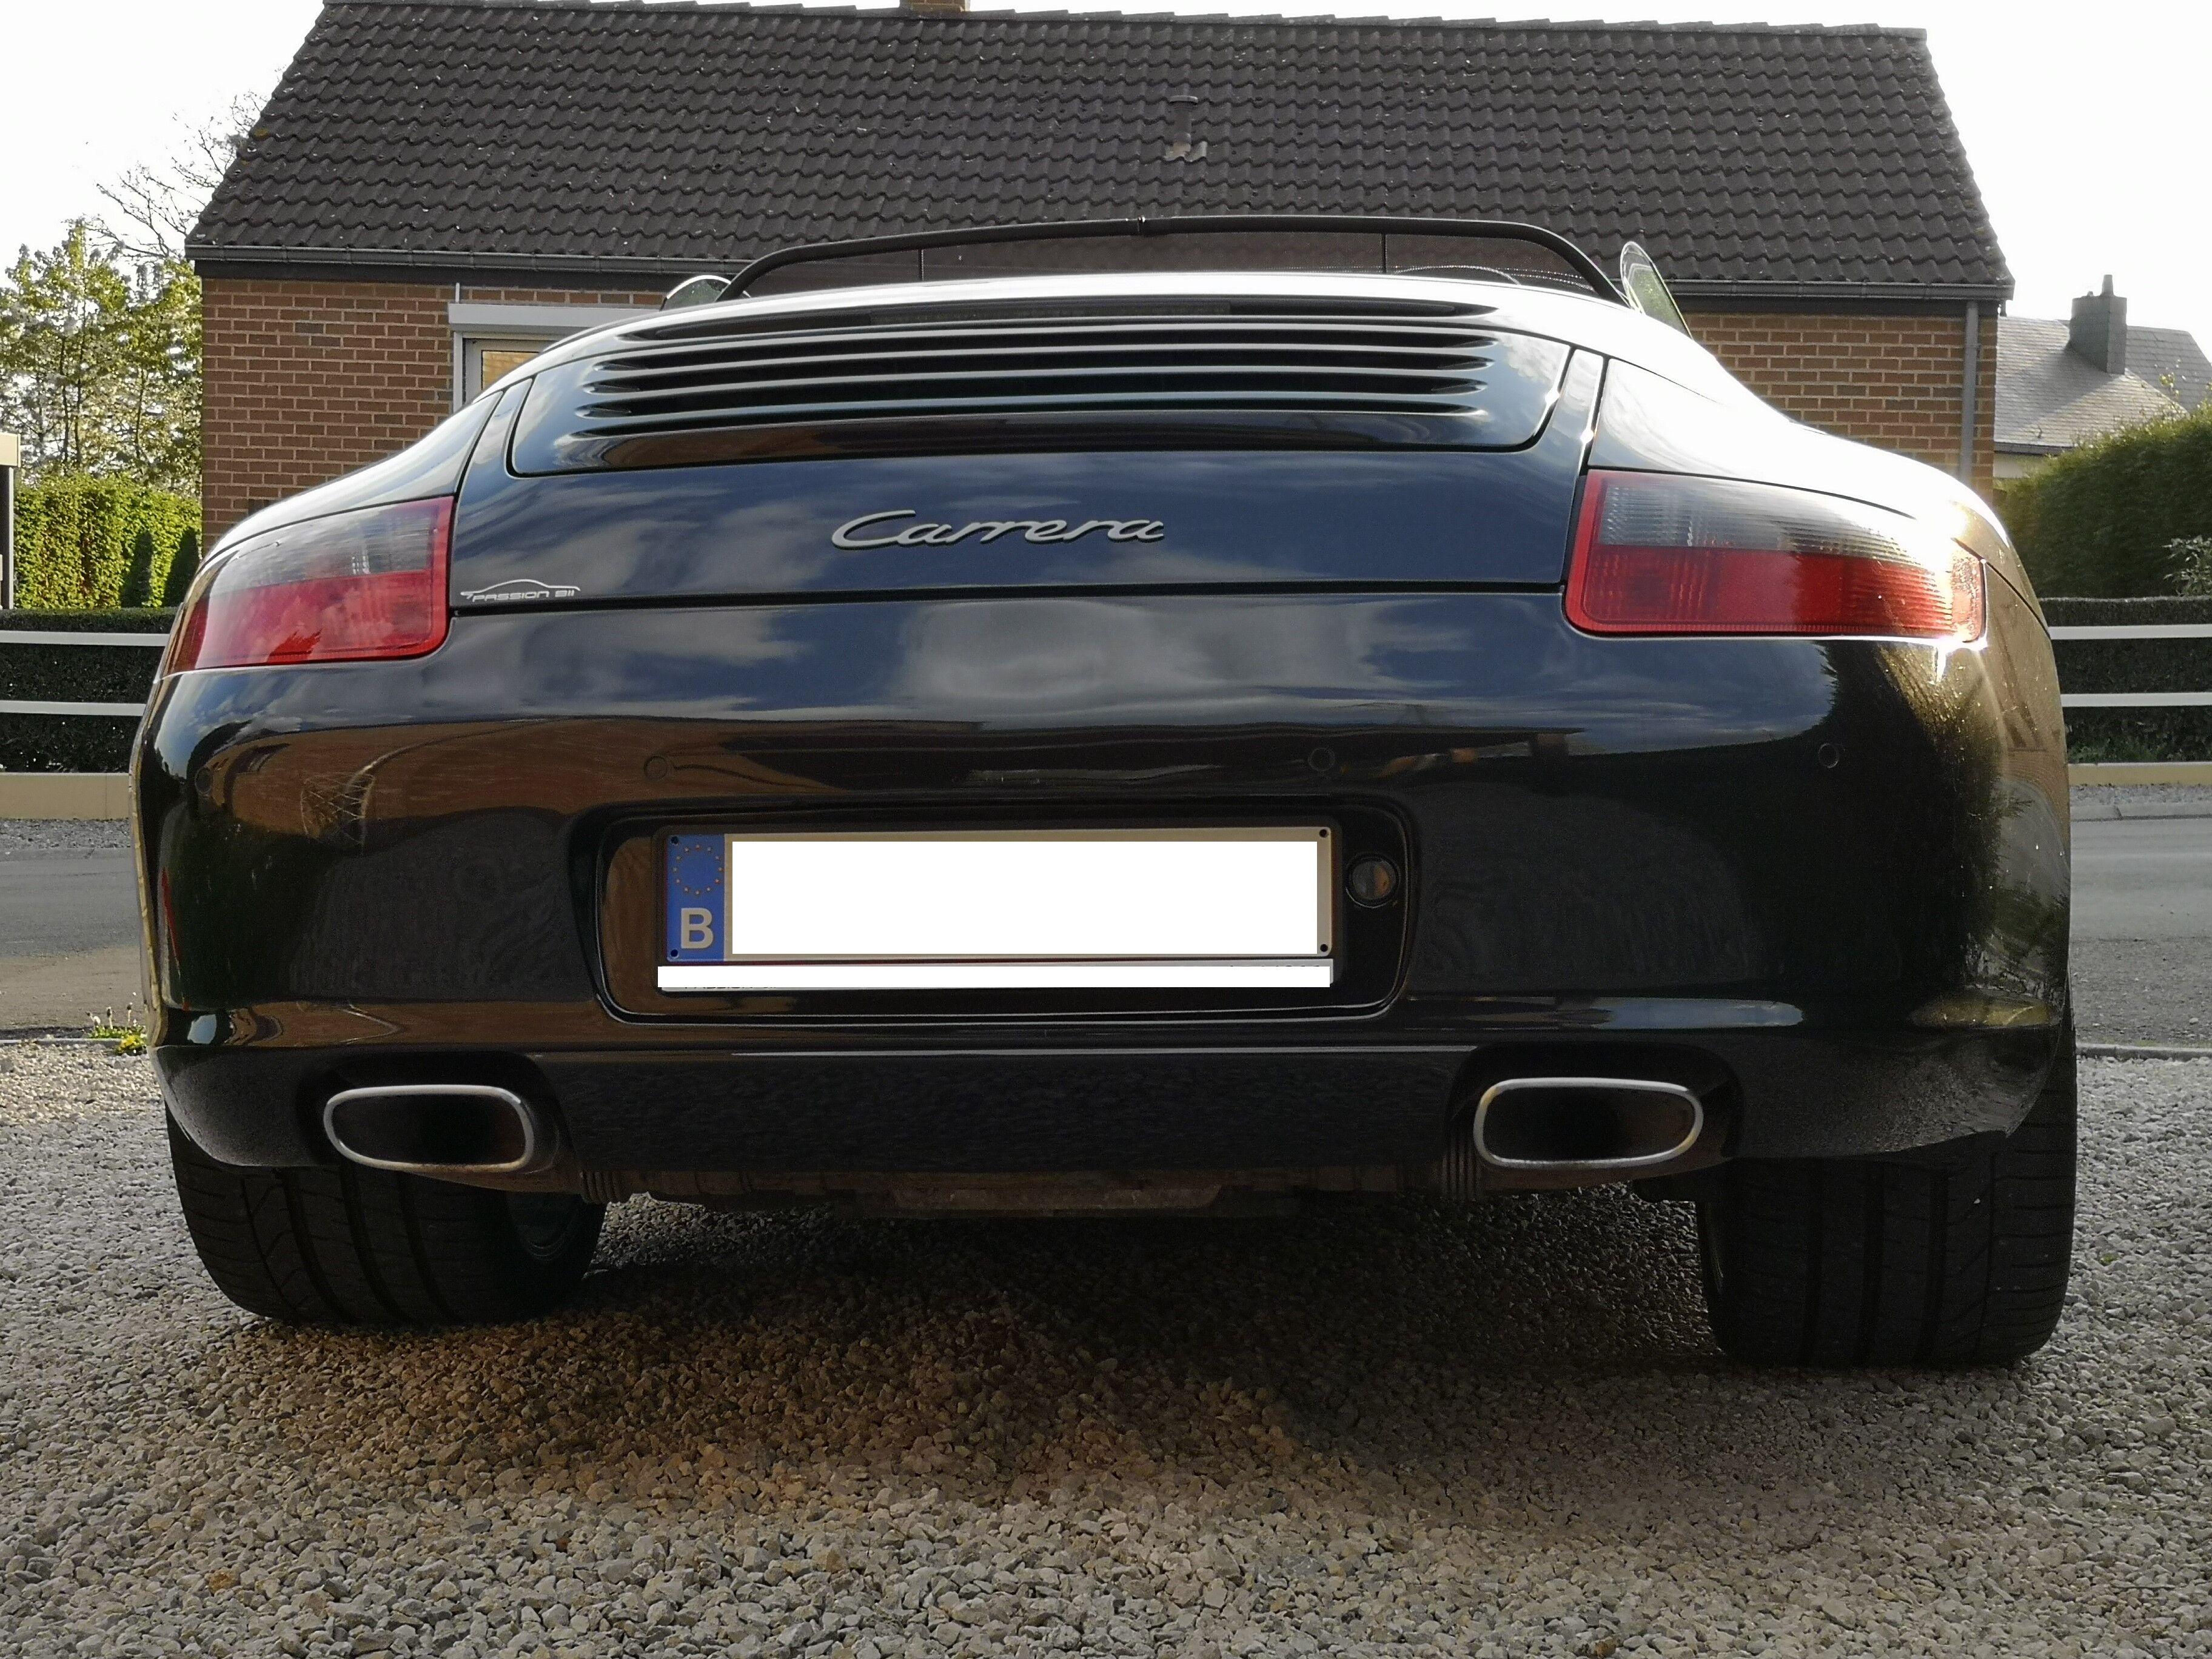 Porsche 911 CARRERA 2 CABRIOLET - 2008 6/15